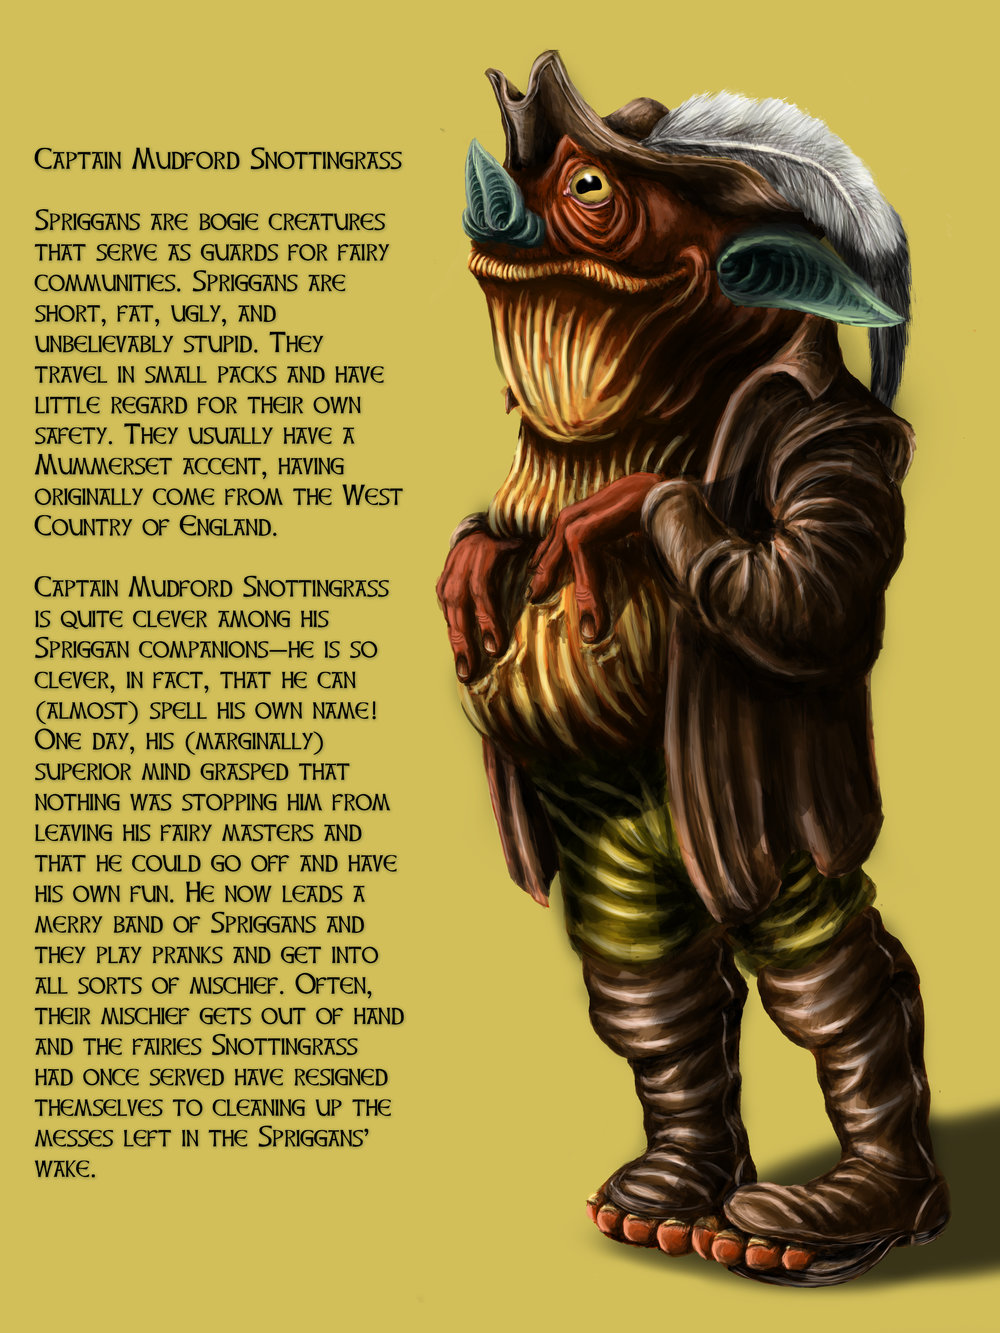 Captain Mudford Snottingrass, Concept Art